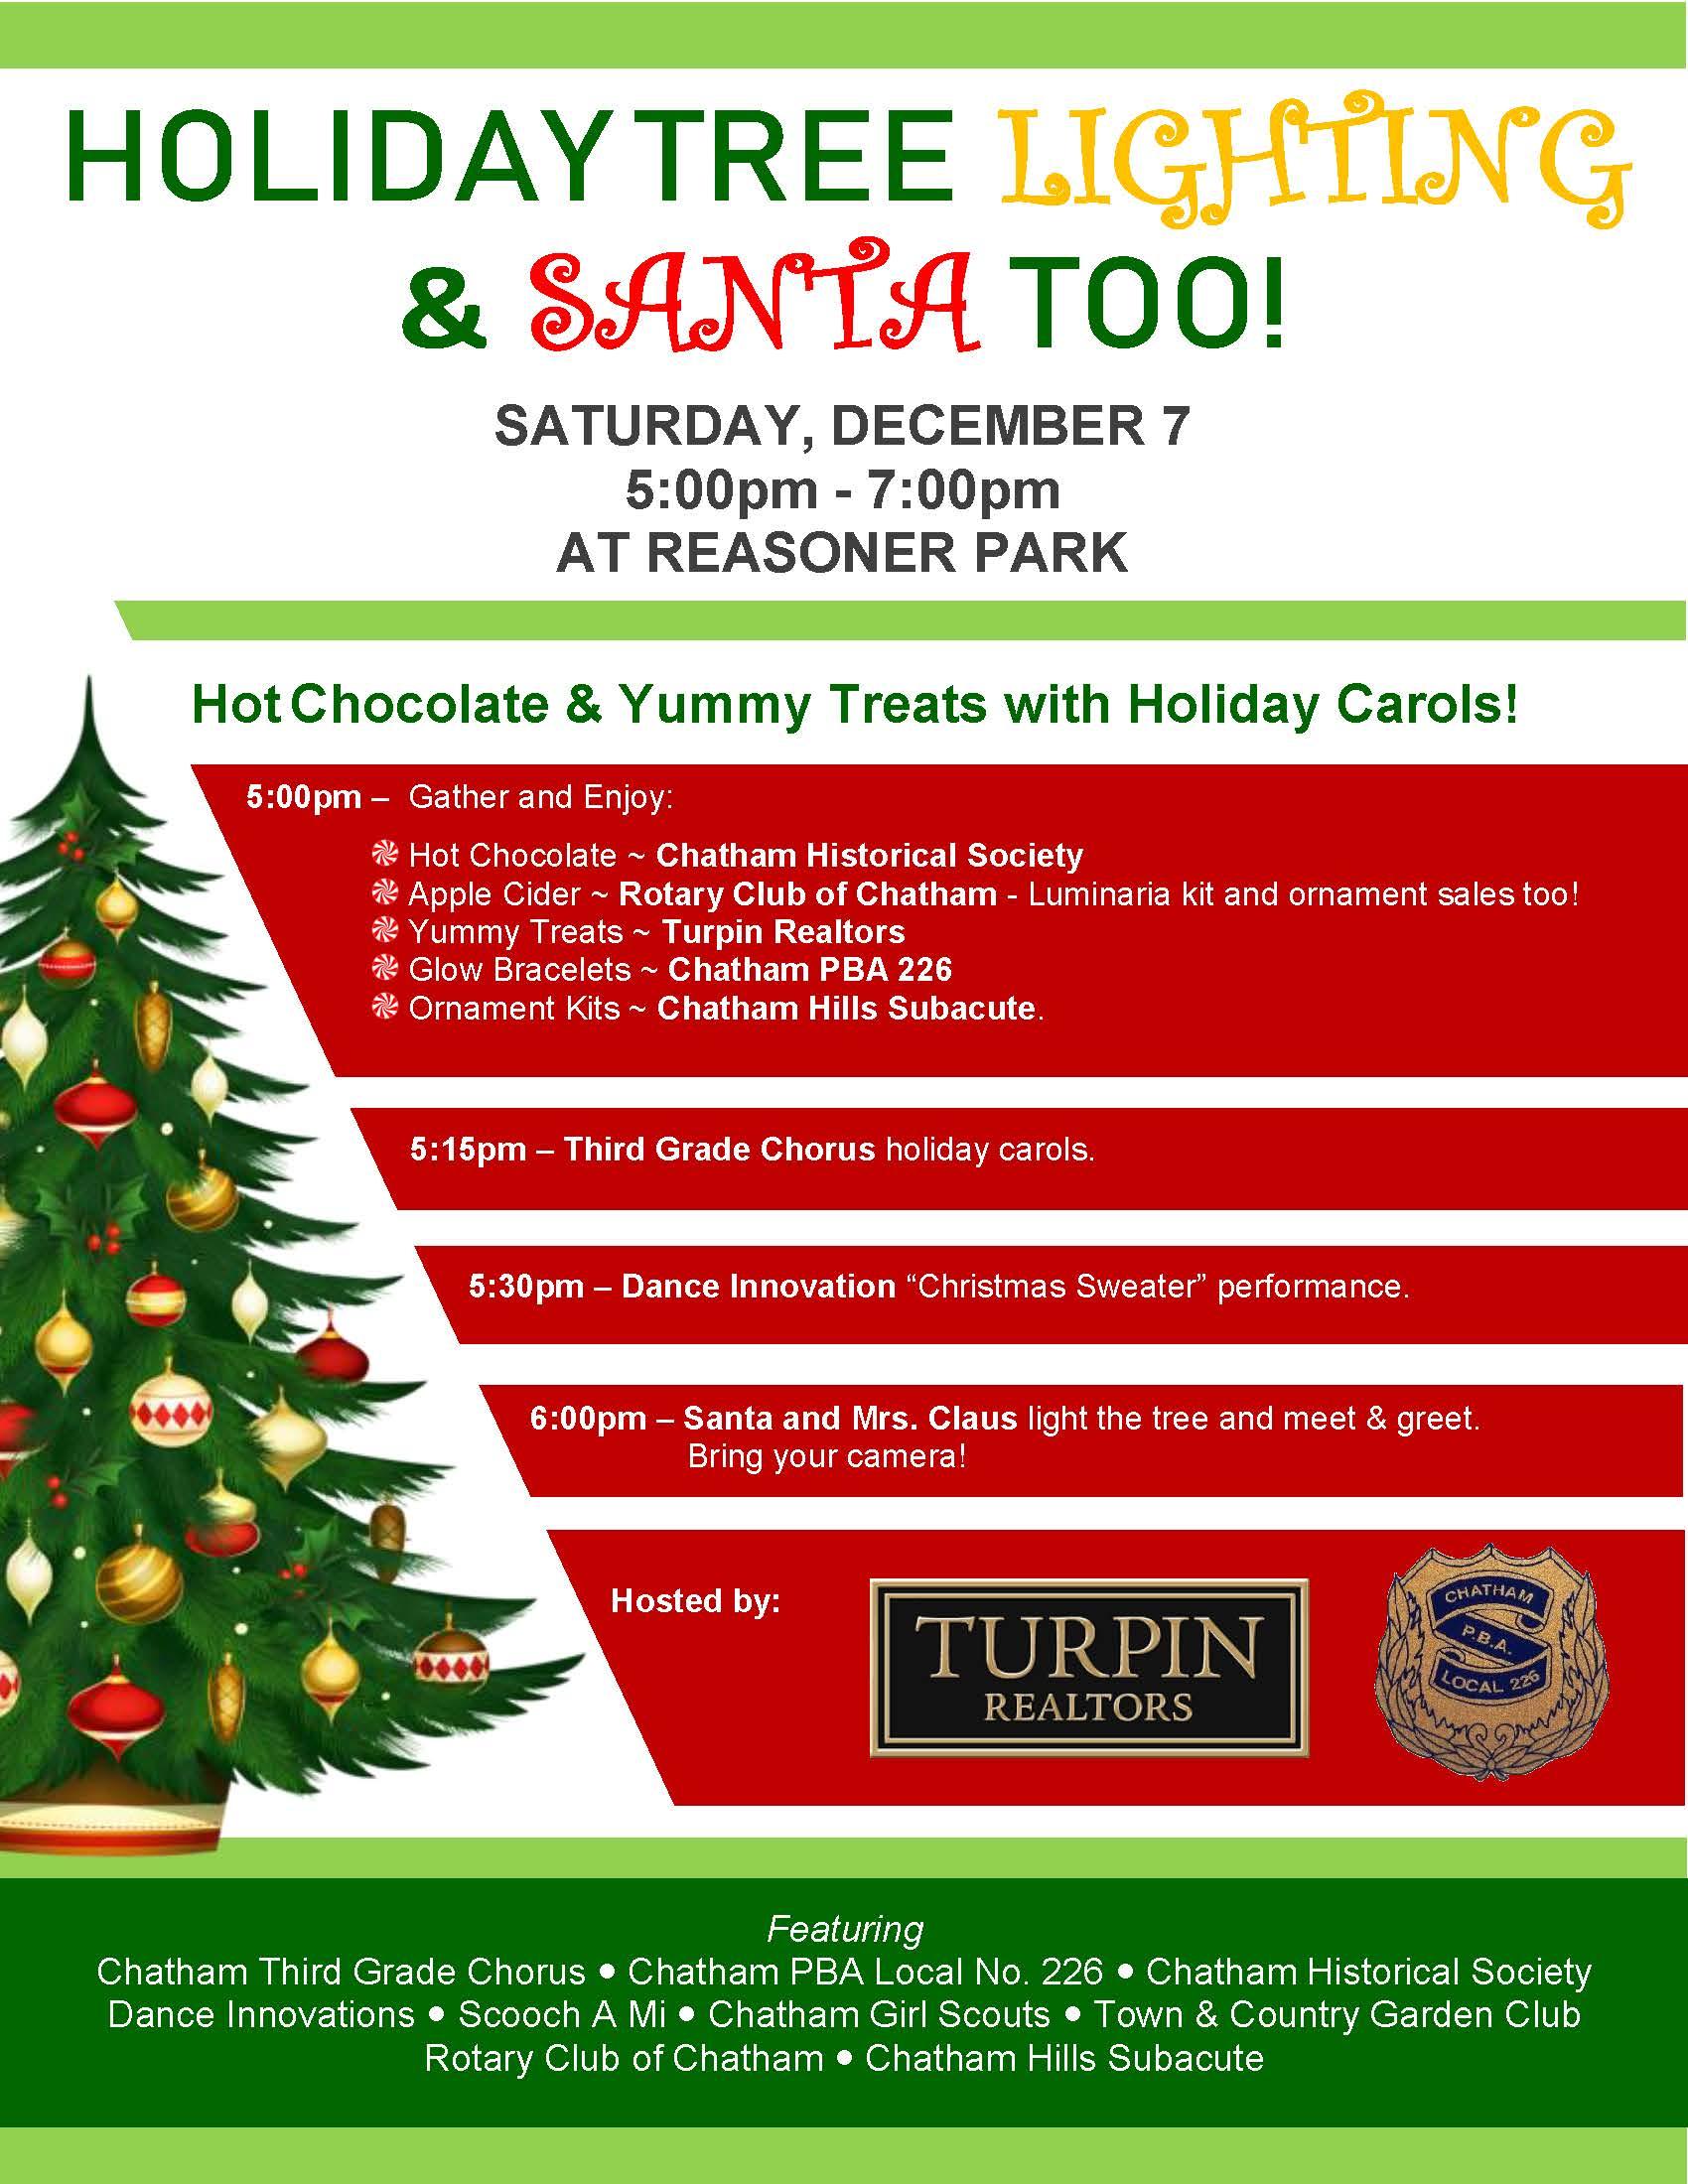 Chatham Holiday Tree Lighting & Santa Visit @ Reasoner Park